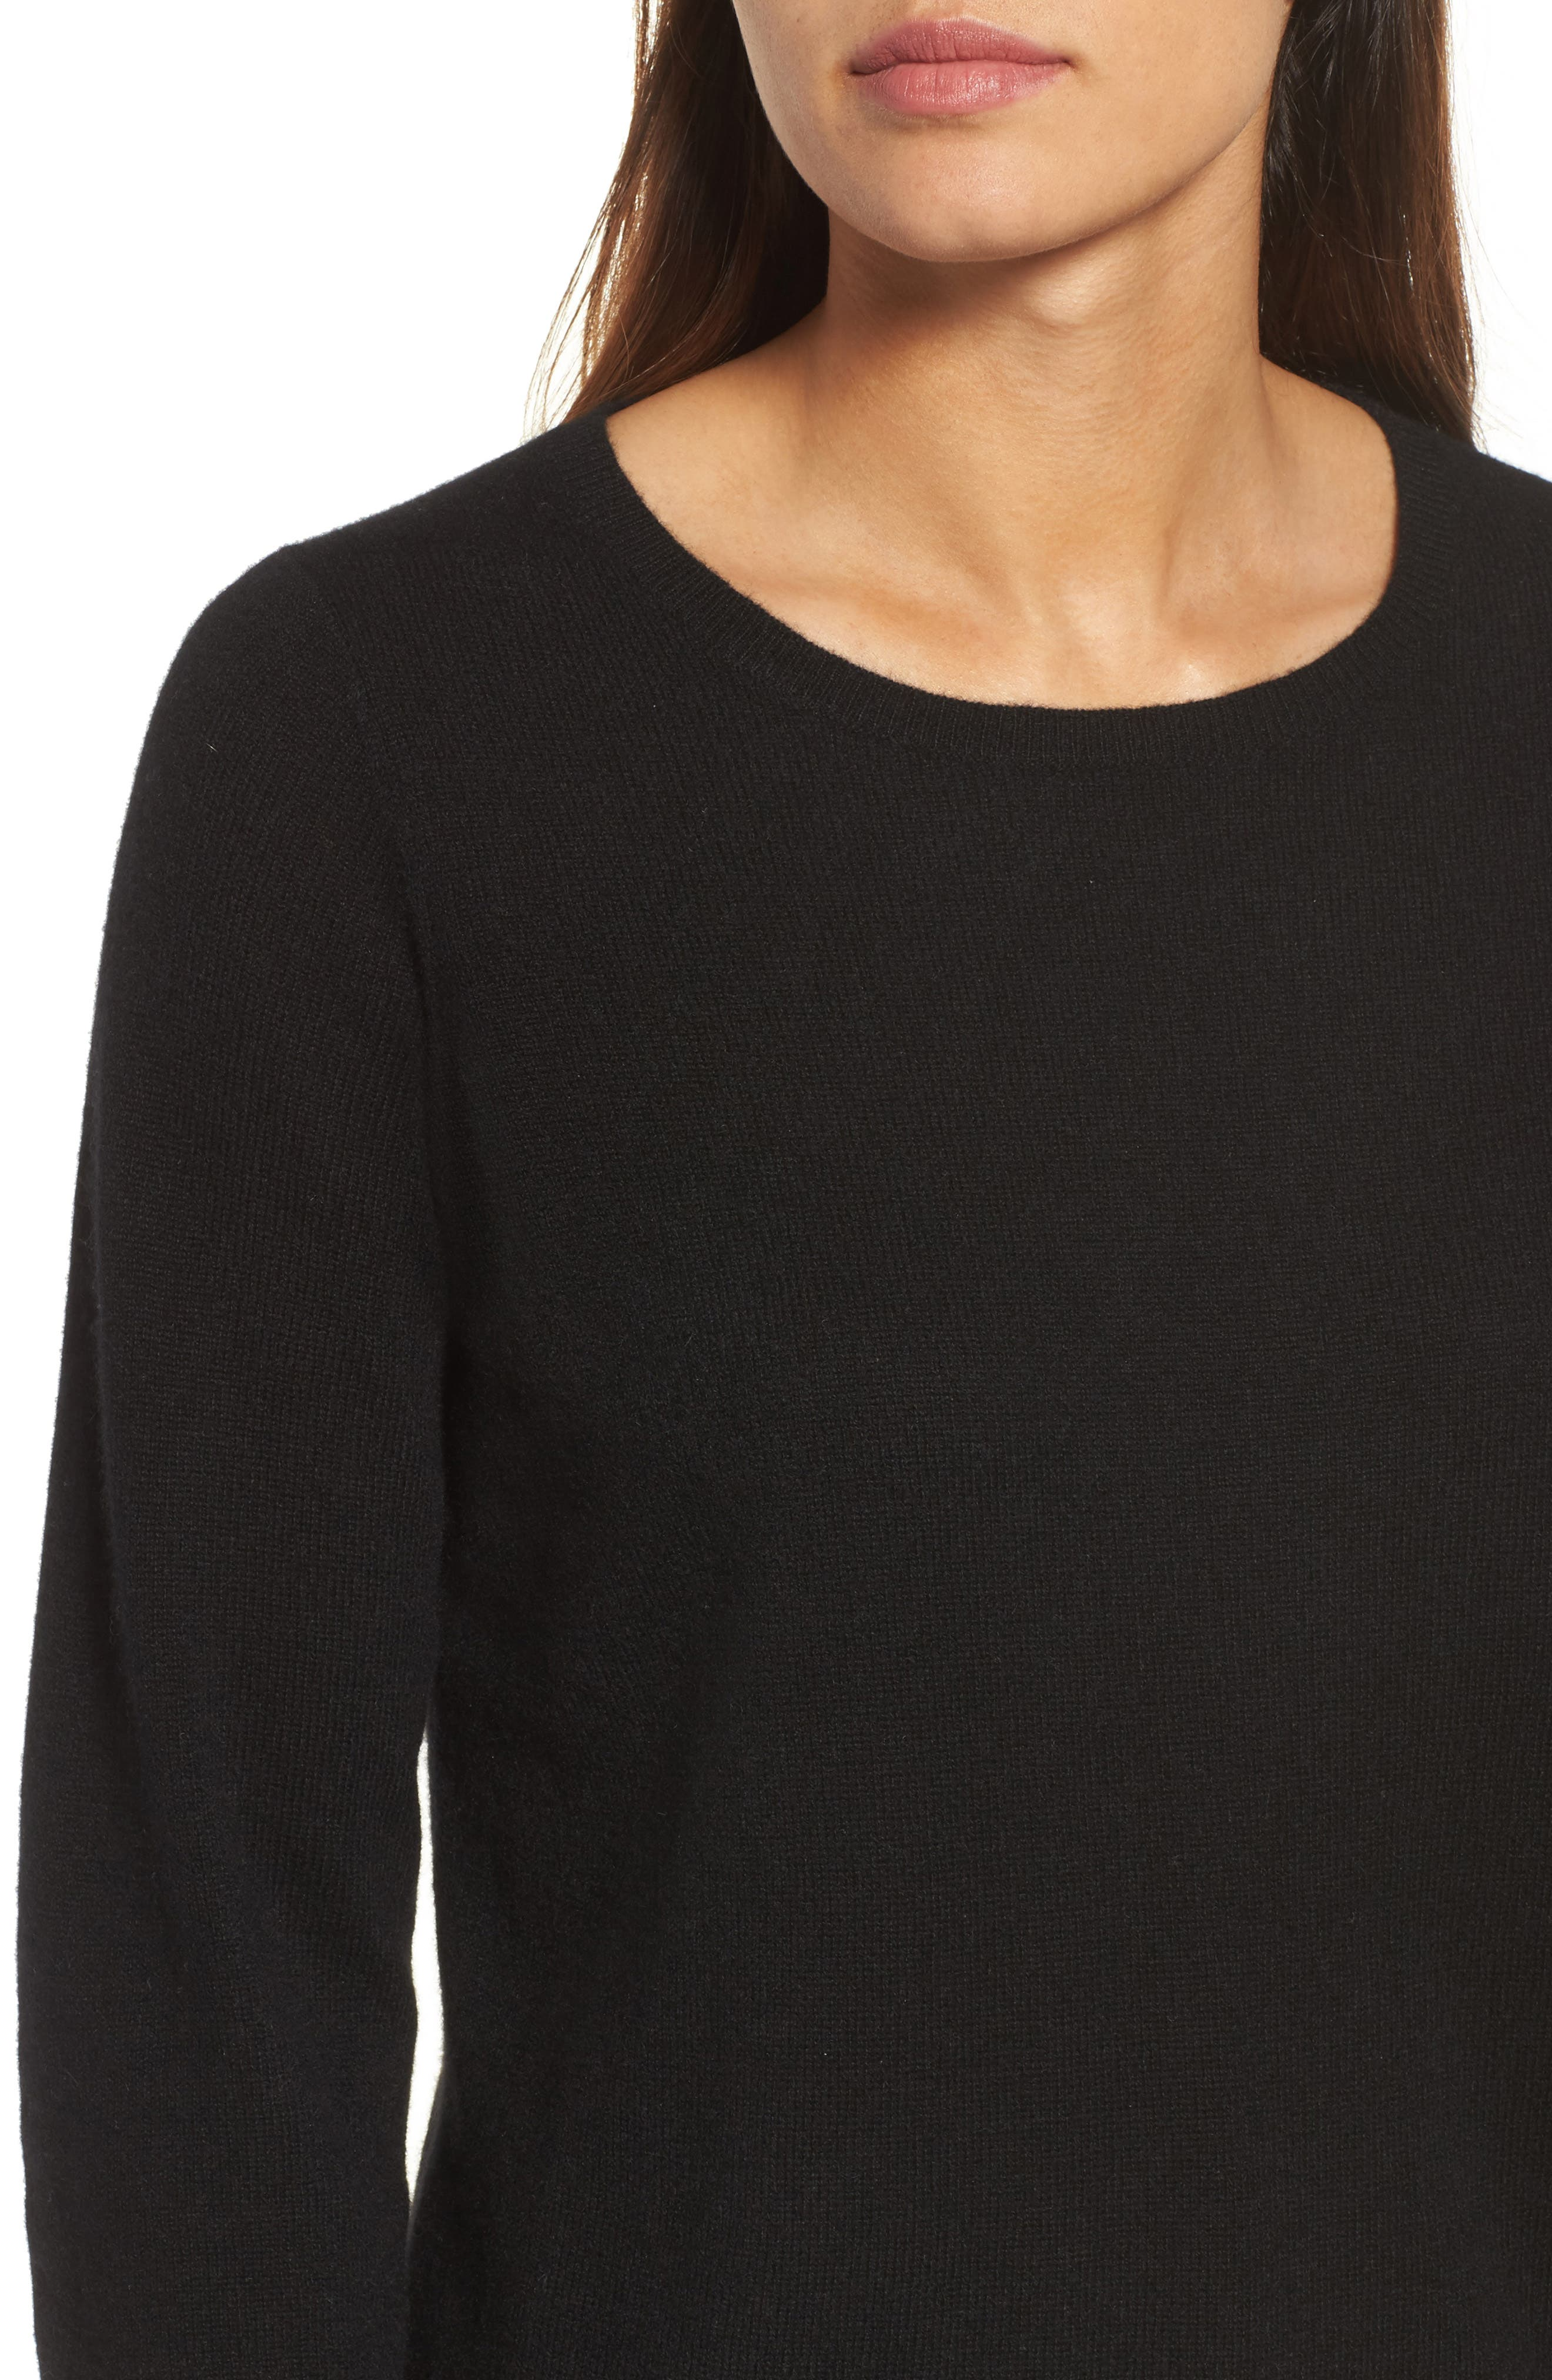 Cashmere Sweater,                             Alternate thumbnail 4, color,                             001